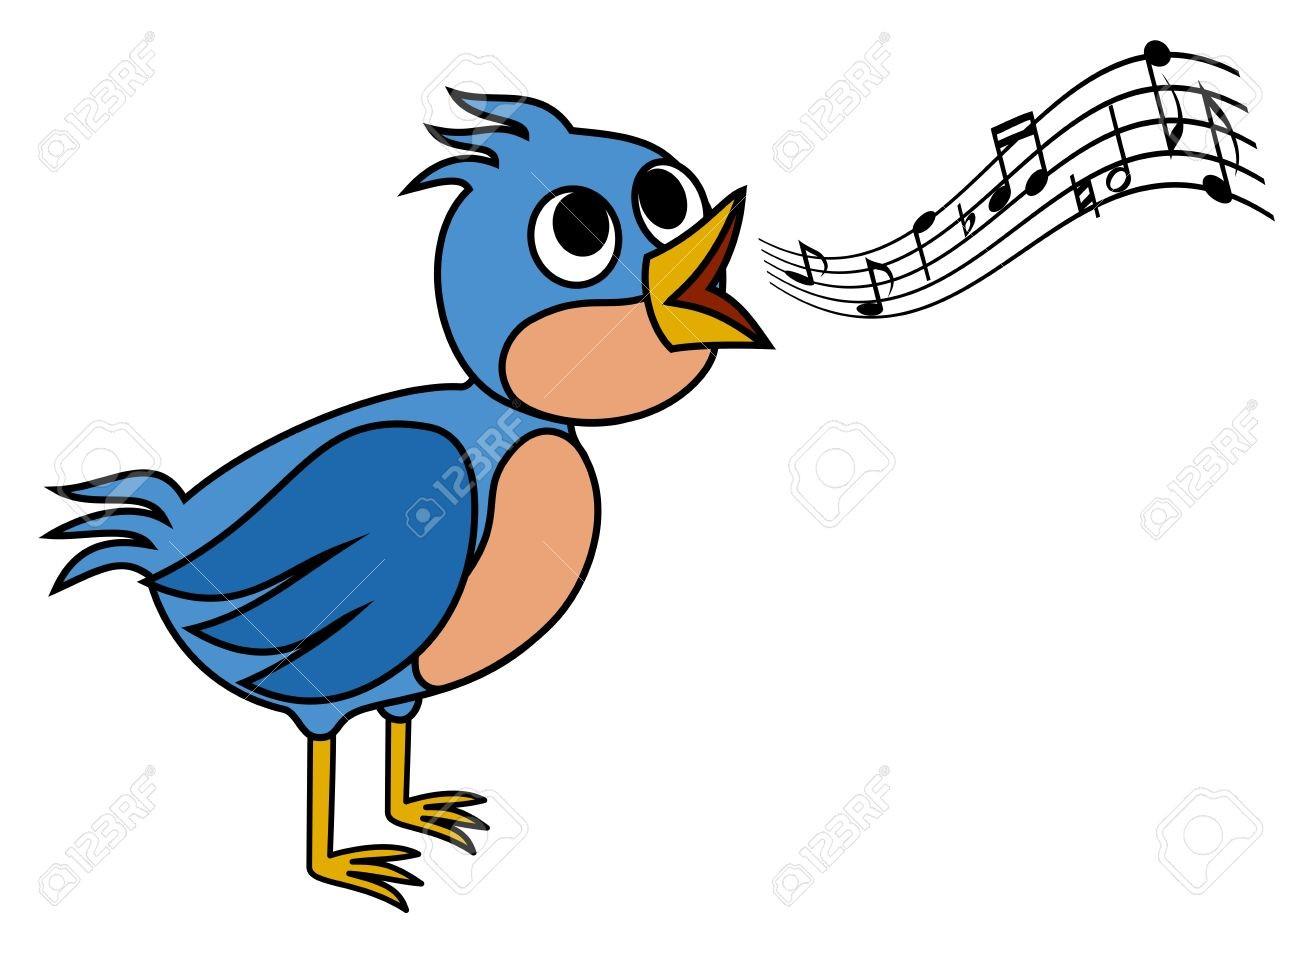 Bird singing clipart vector transparent library With Bird Singing Clipart 26978577 | Clip Art vector transparent library